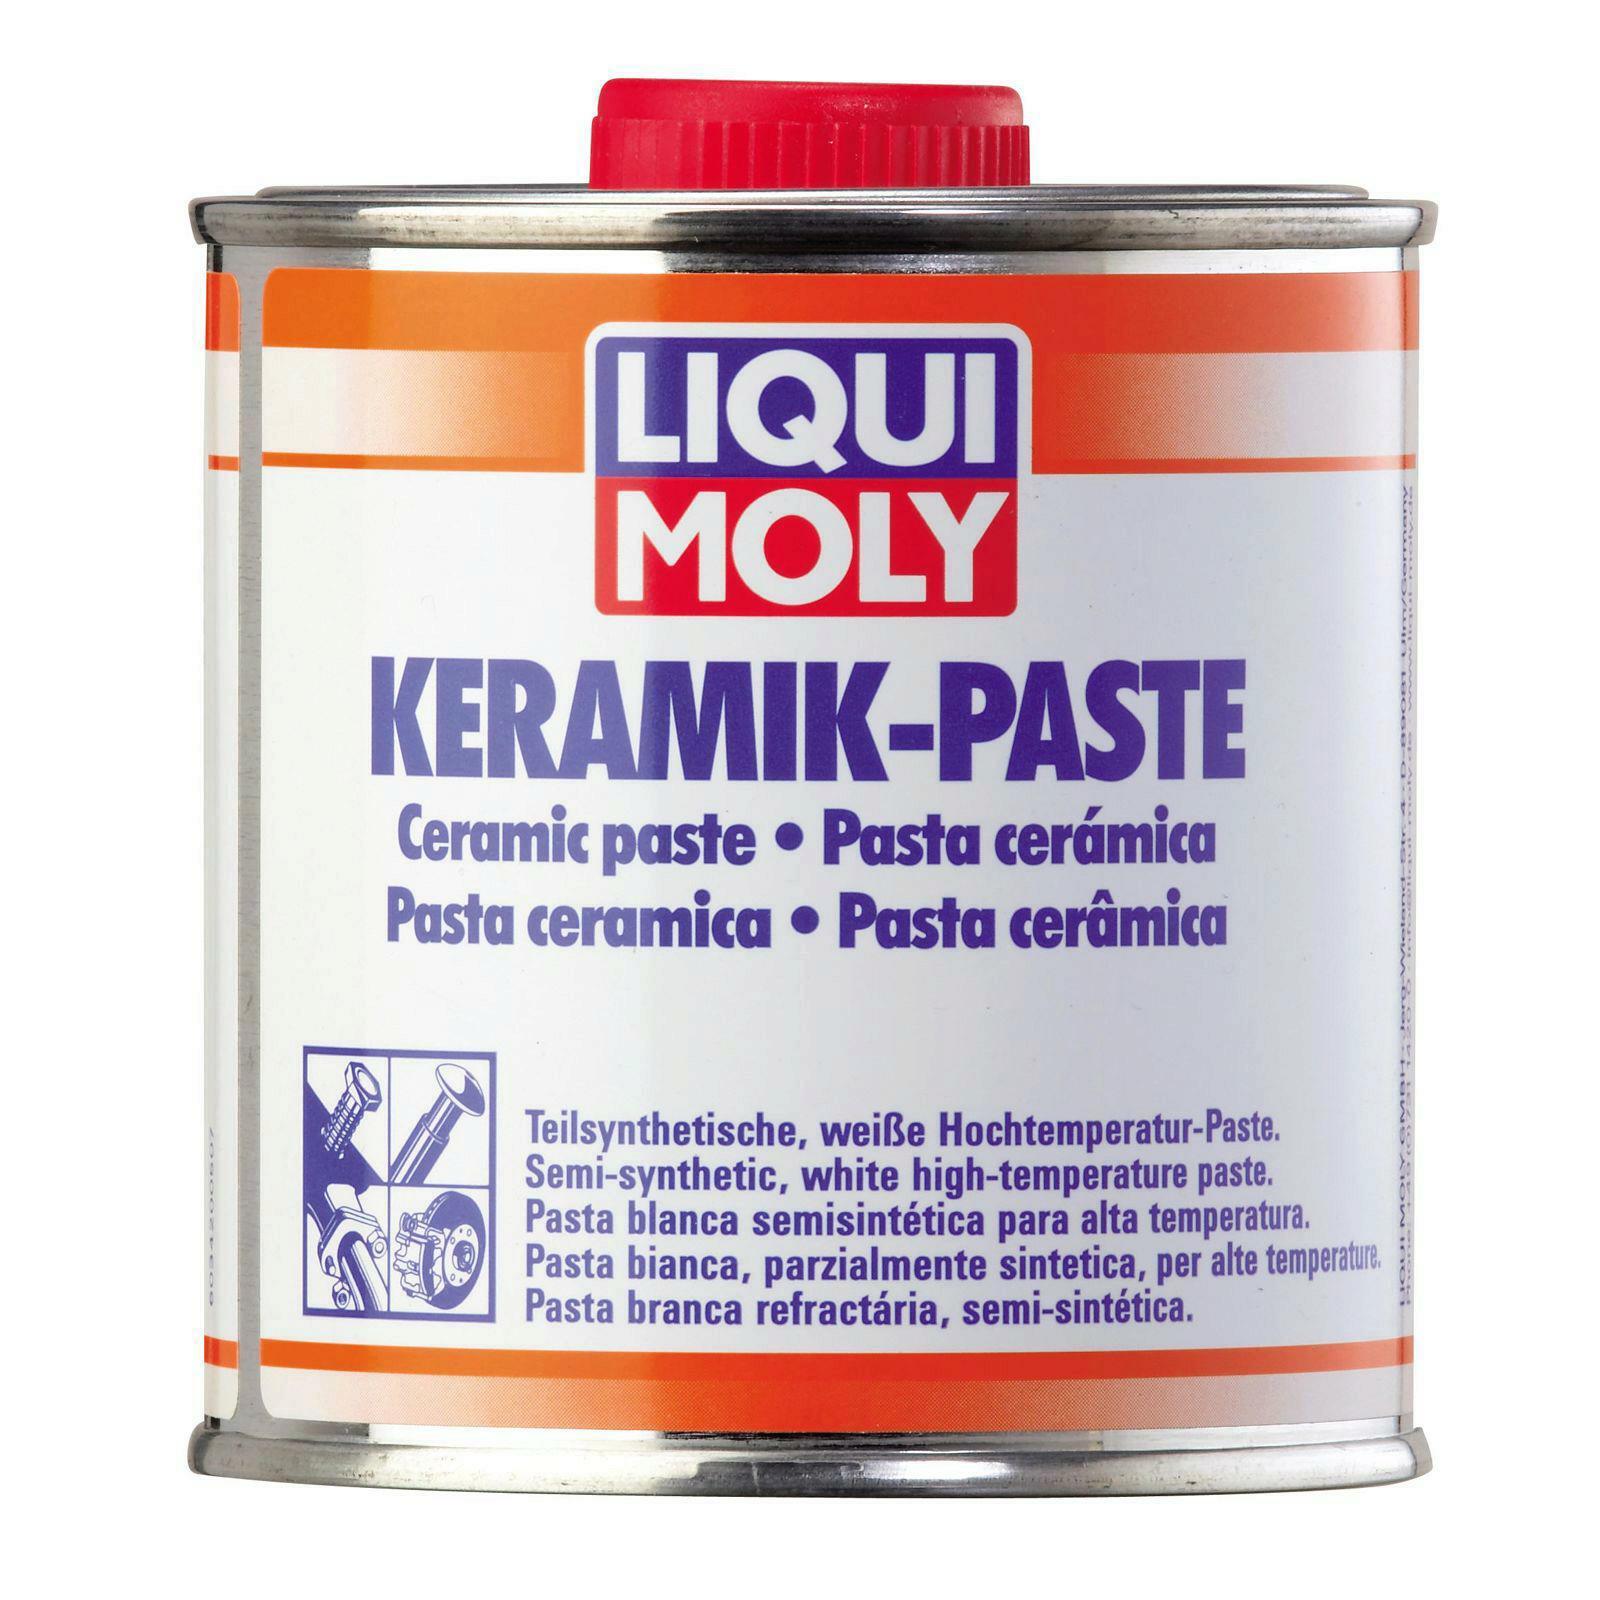 Liqui Moly Kerami-Paste 250g